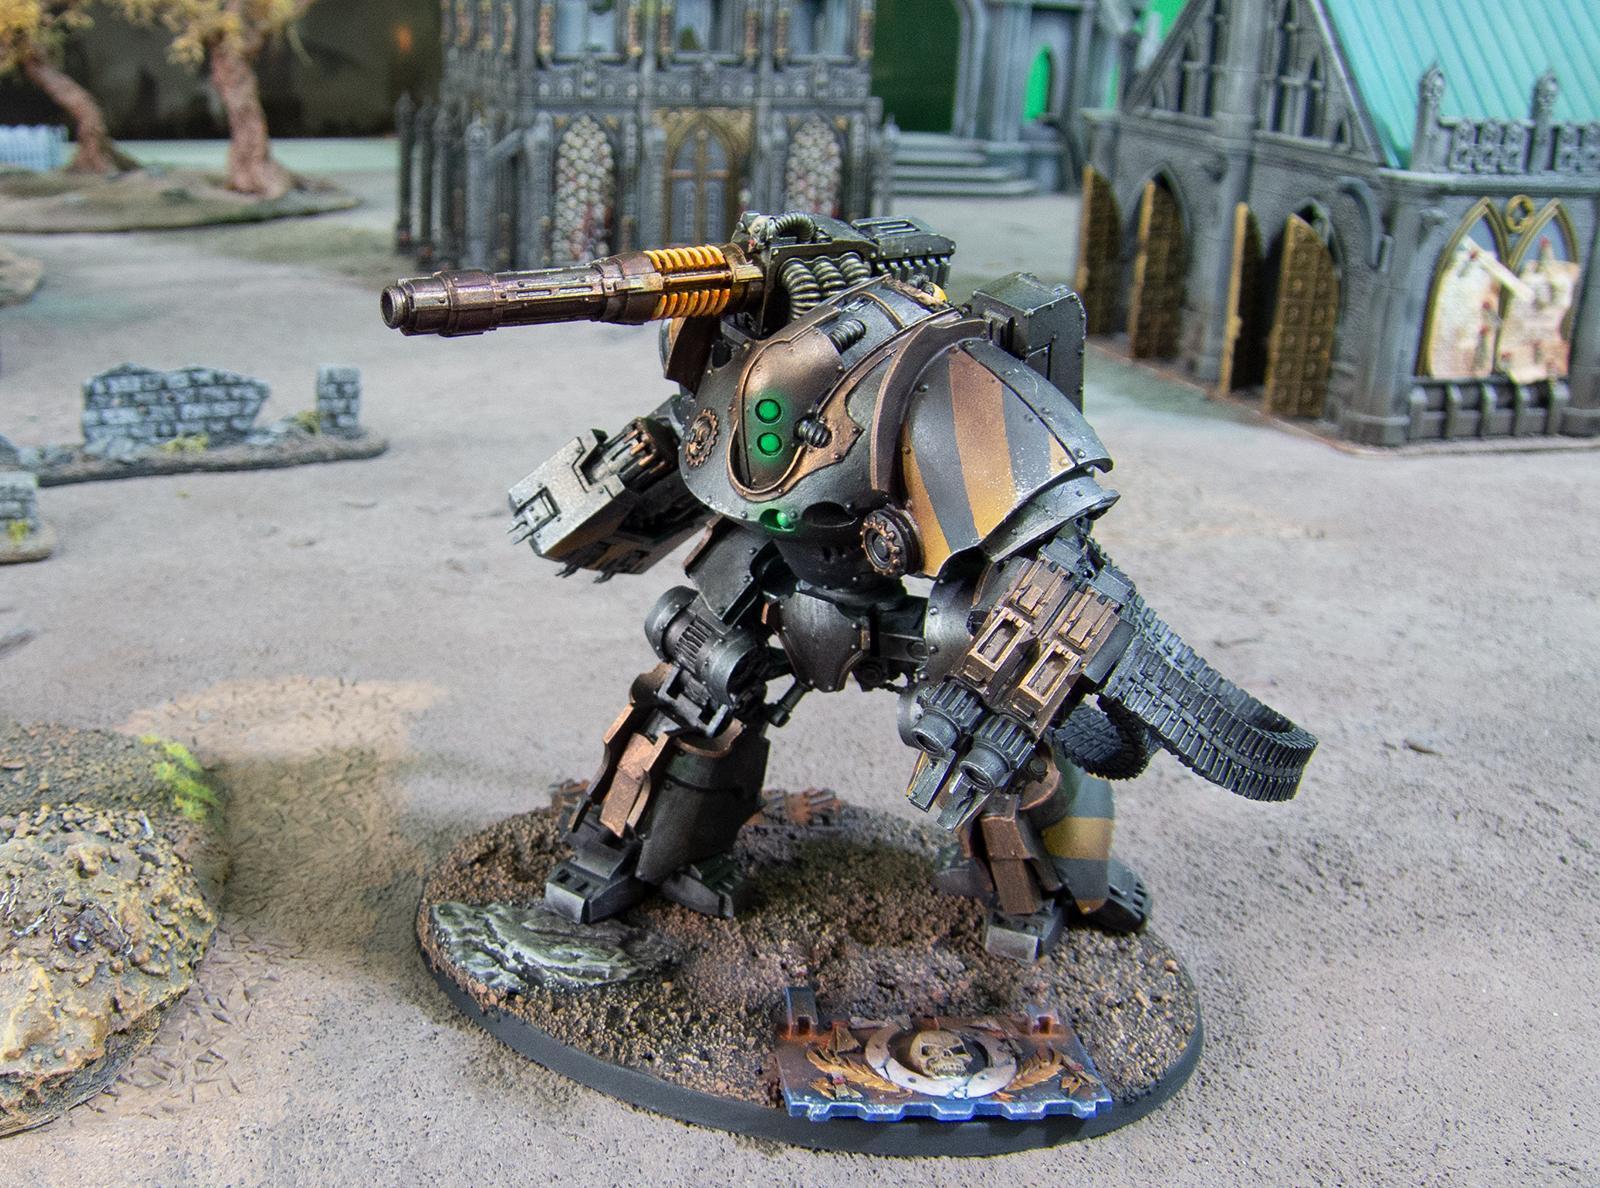 Automata, Calix, Iron Warriors, Mechanicum, Siege, Thanatar, Thanatar-calix